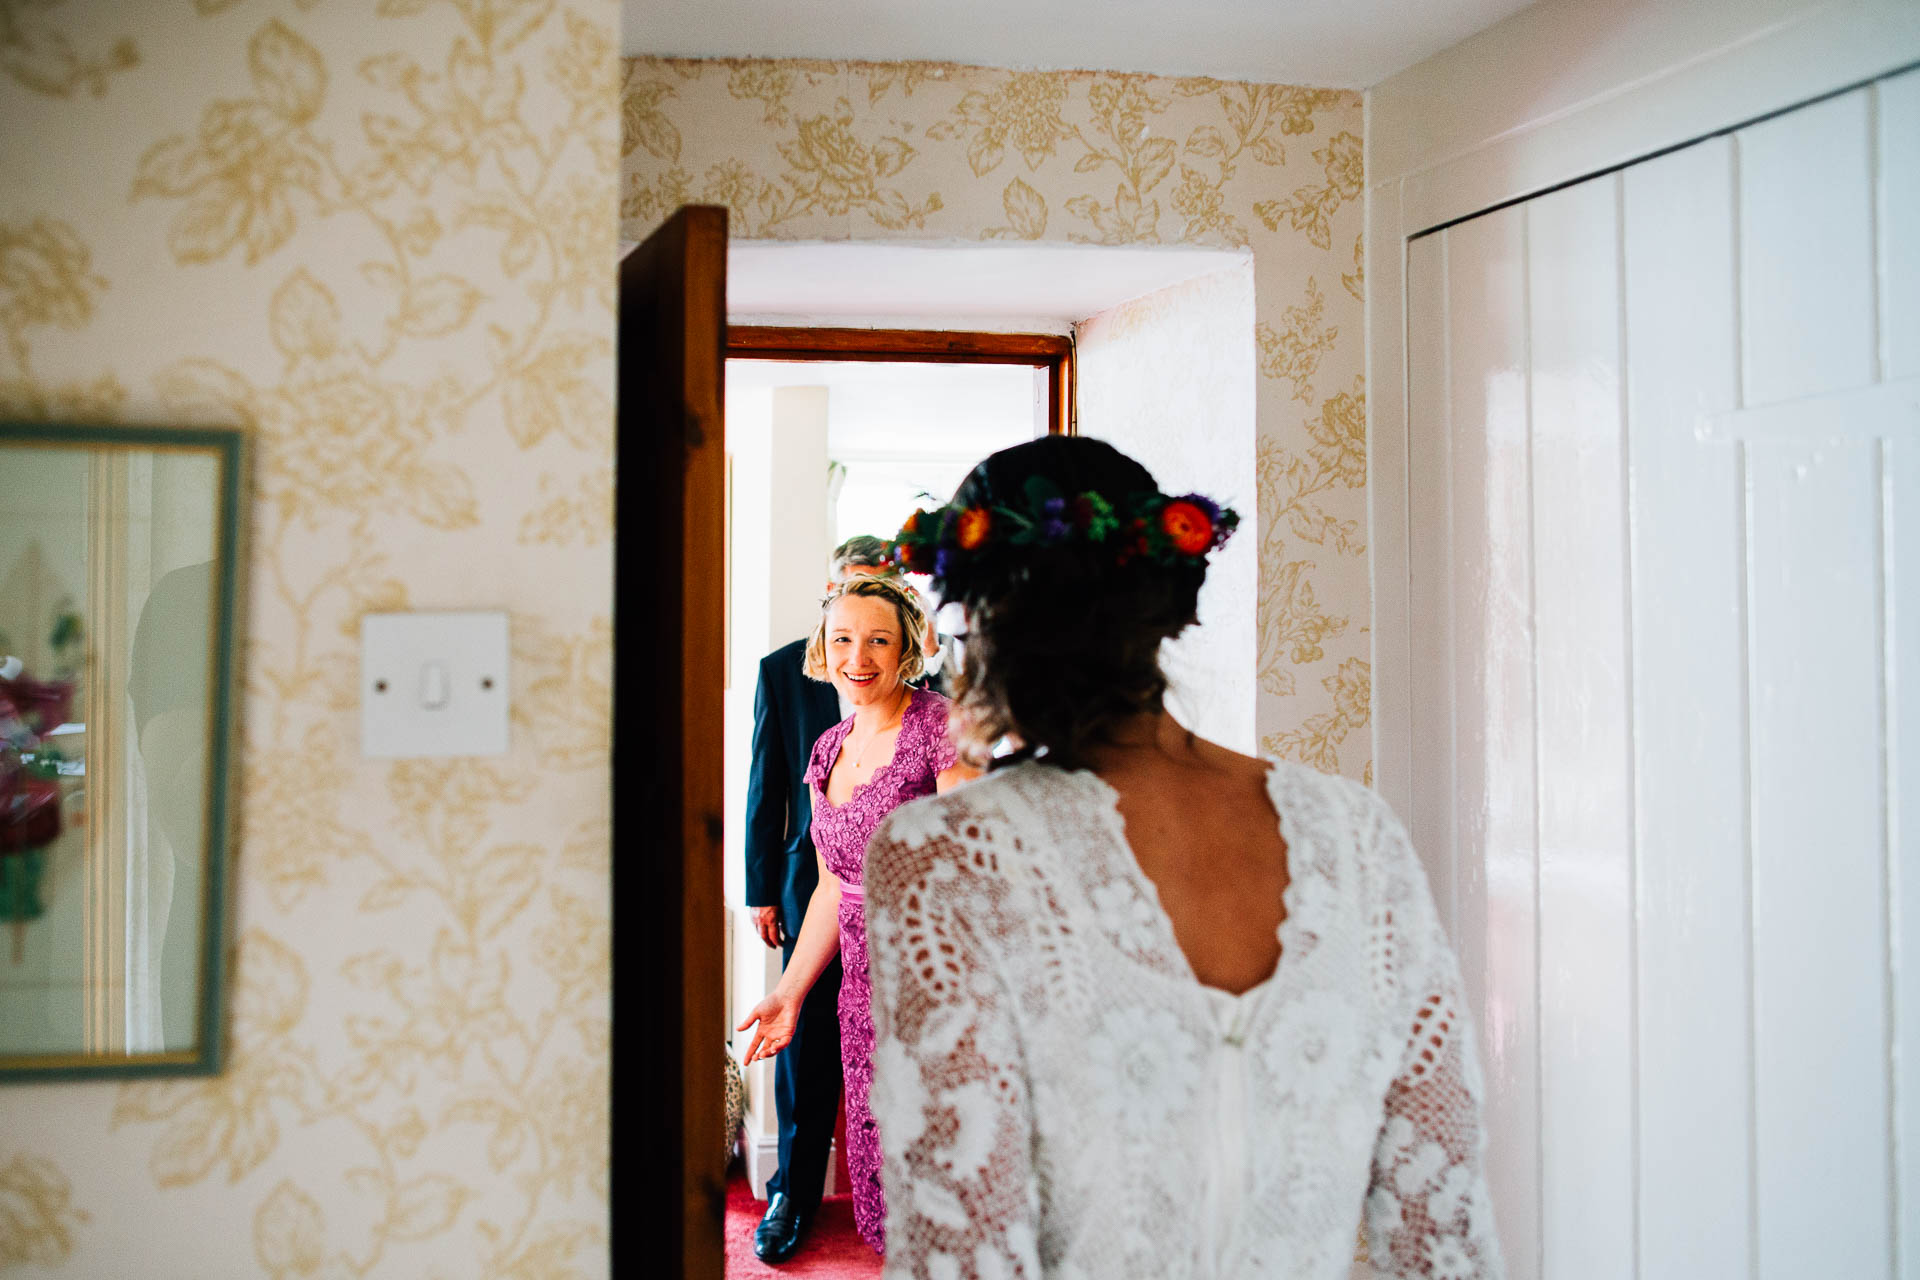 winterbourne-medieval-barn-wedding-photography-emma-andrew-48